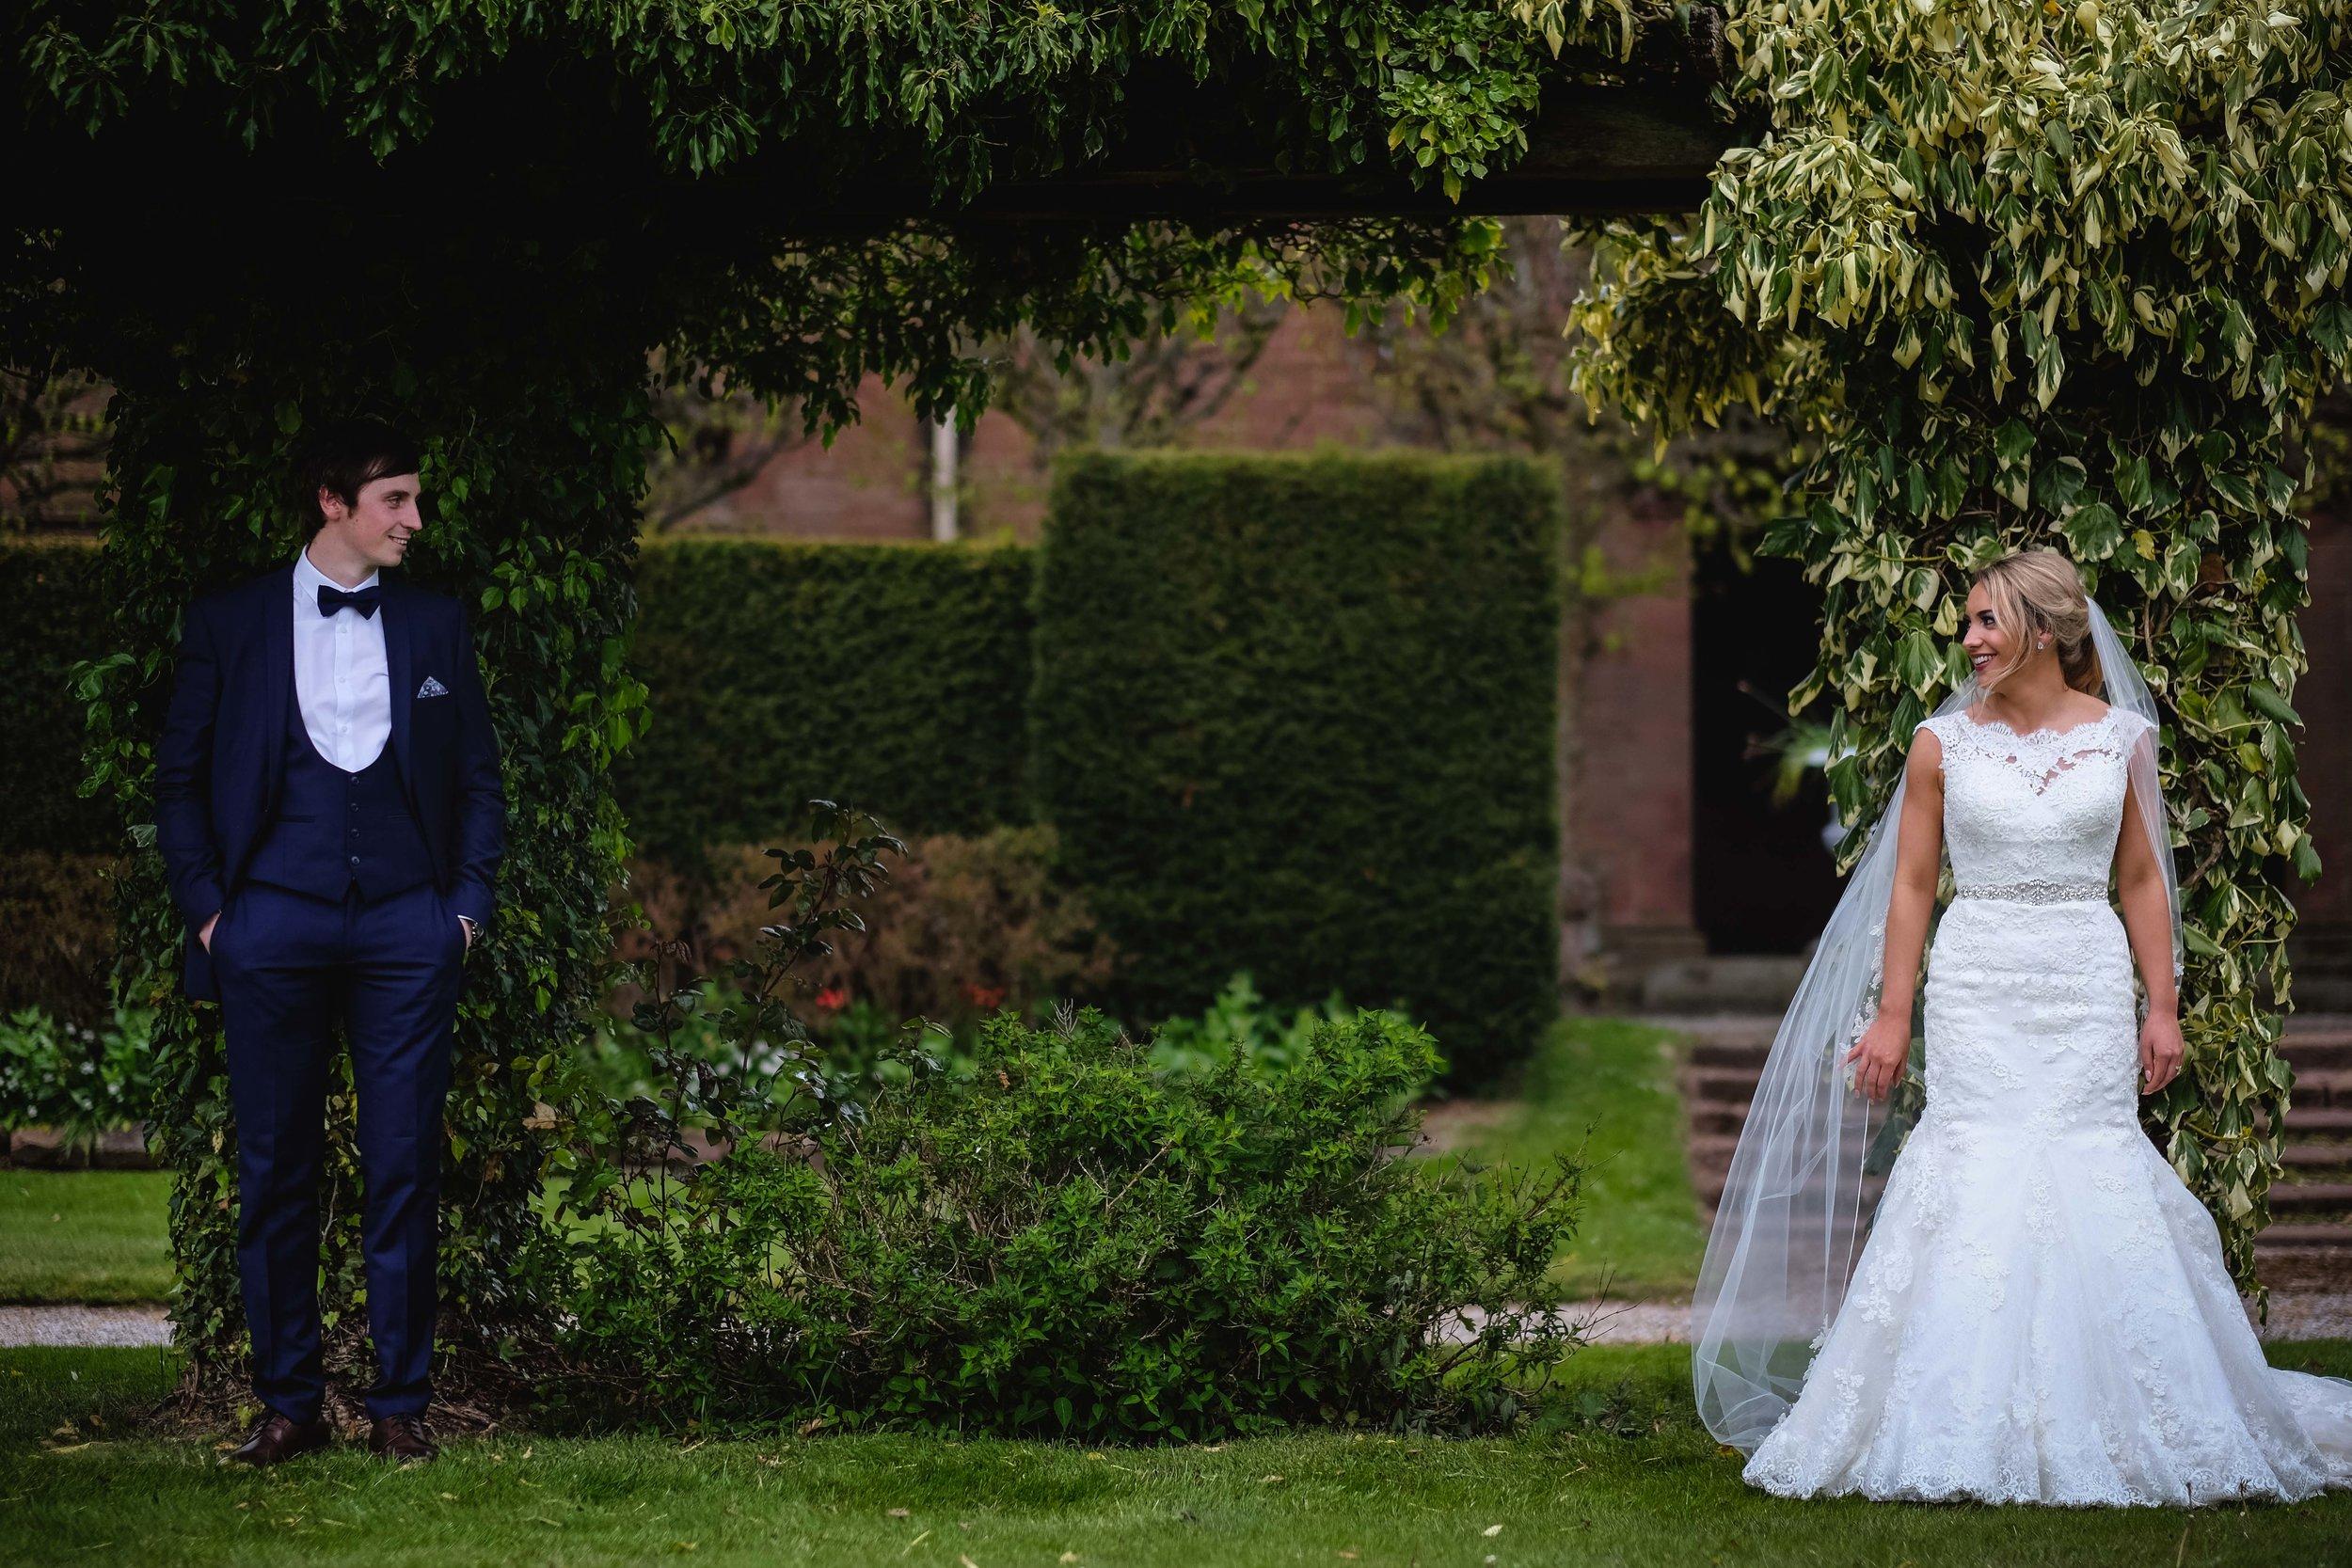 Thornton manor wedding photography cheshire wedding photographer liverpool manchester warrington chester wirral wedding BLOG (80 of 108).jpg